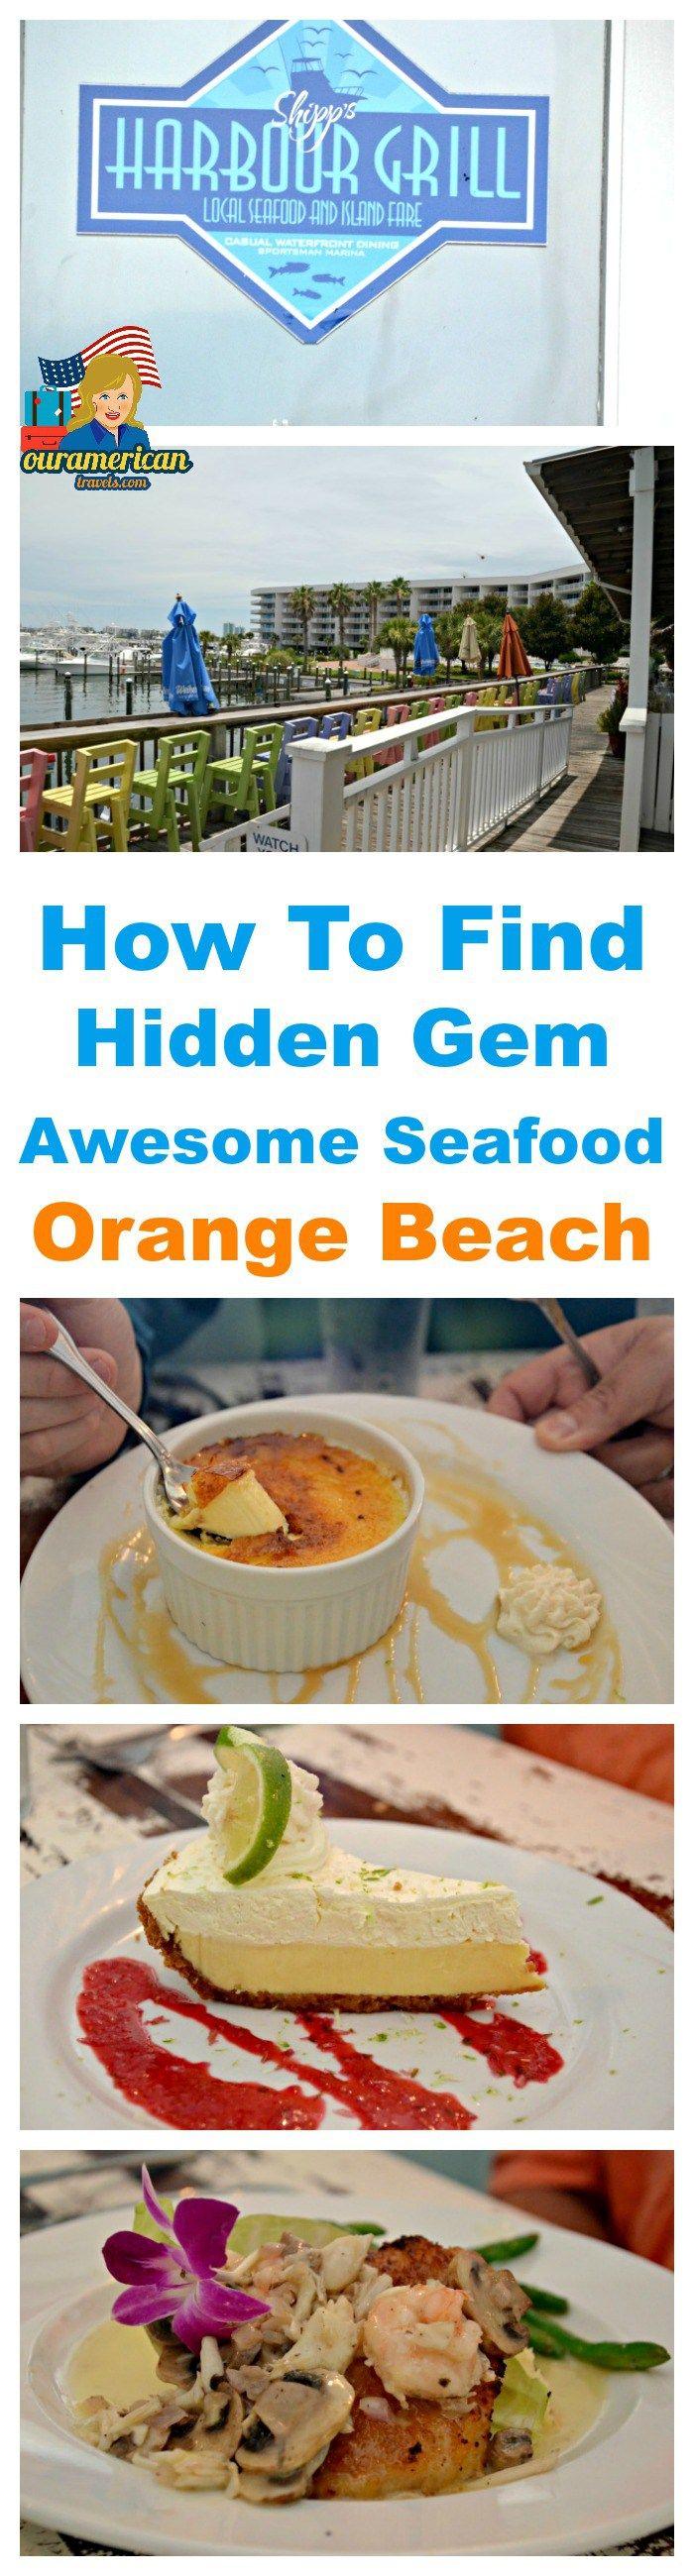 How To Find Hidden Gem Awesome Seafood Orange Beach #orange beach #seafood…